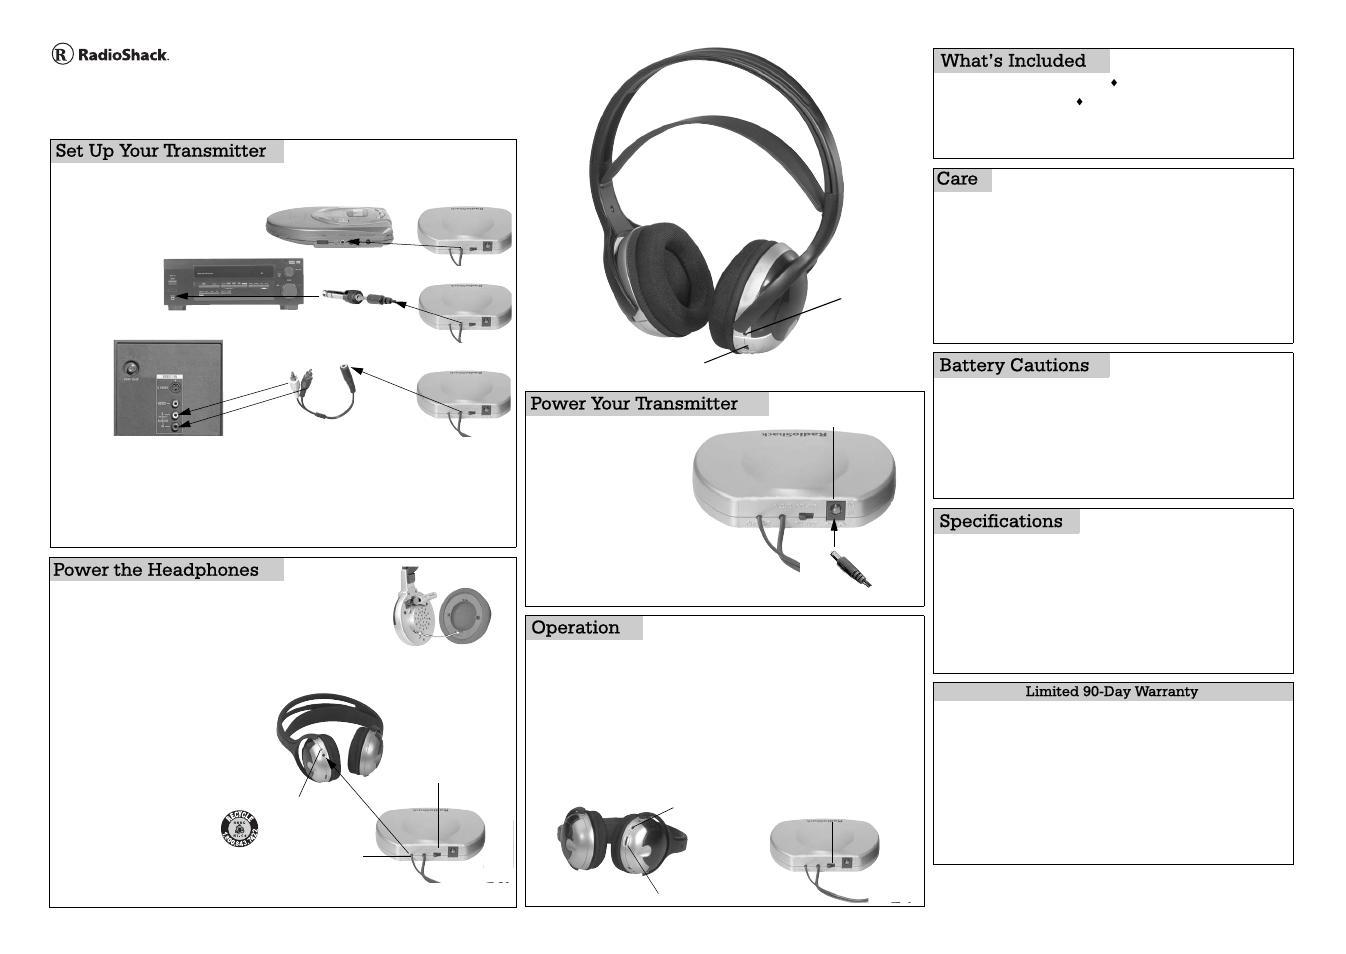 Radio Shack 33 User Manual